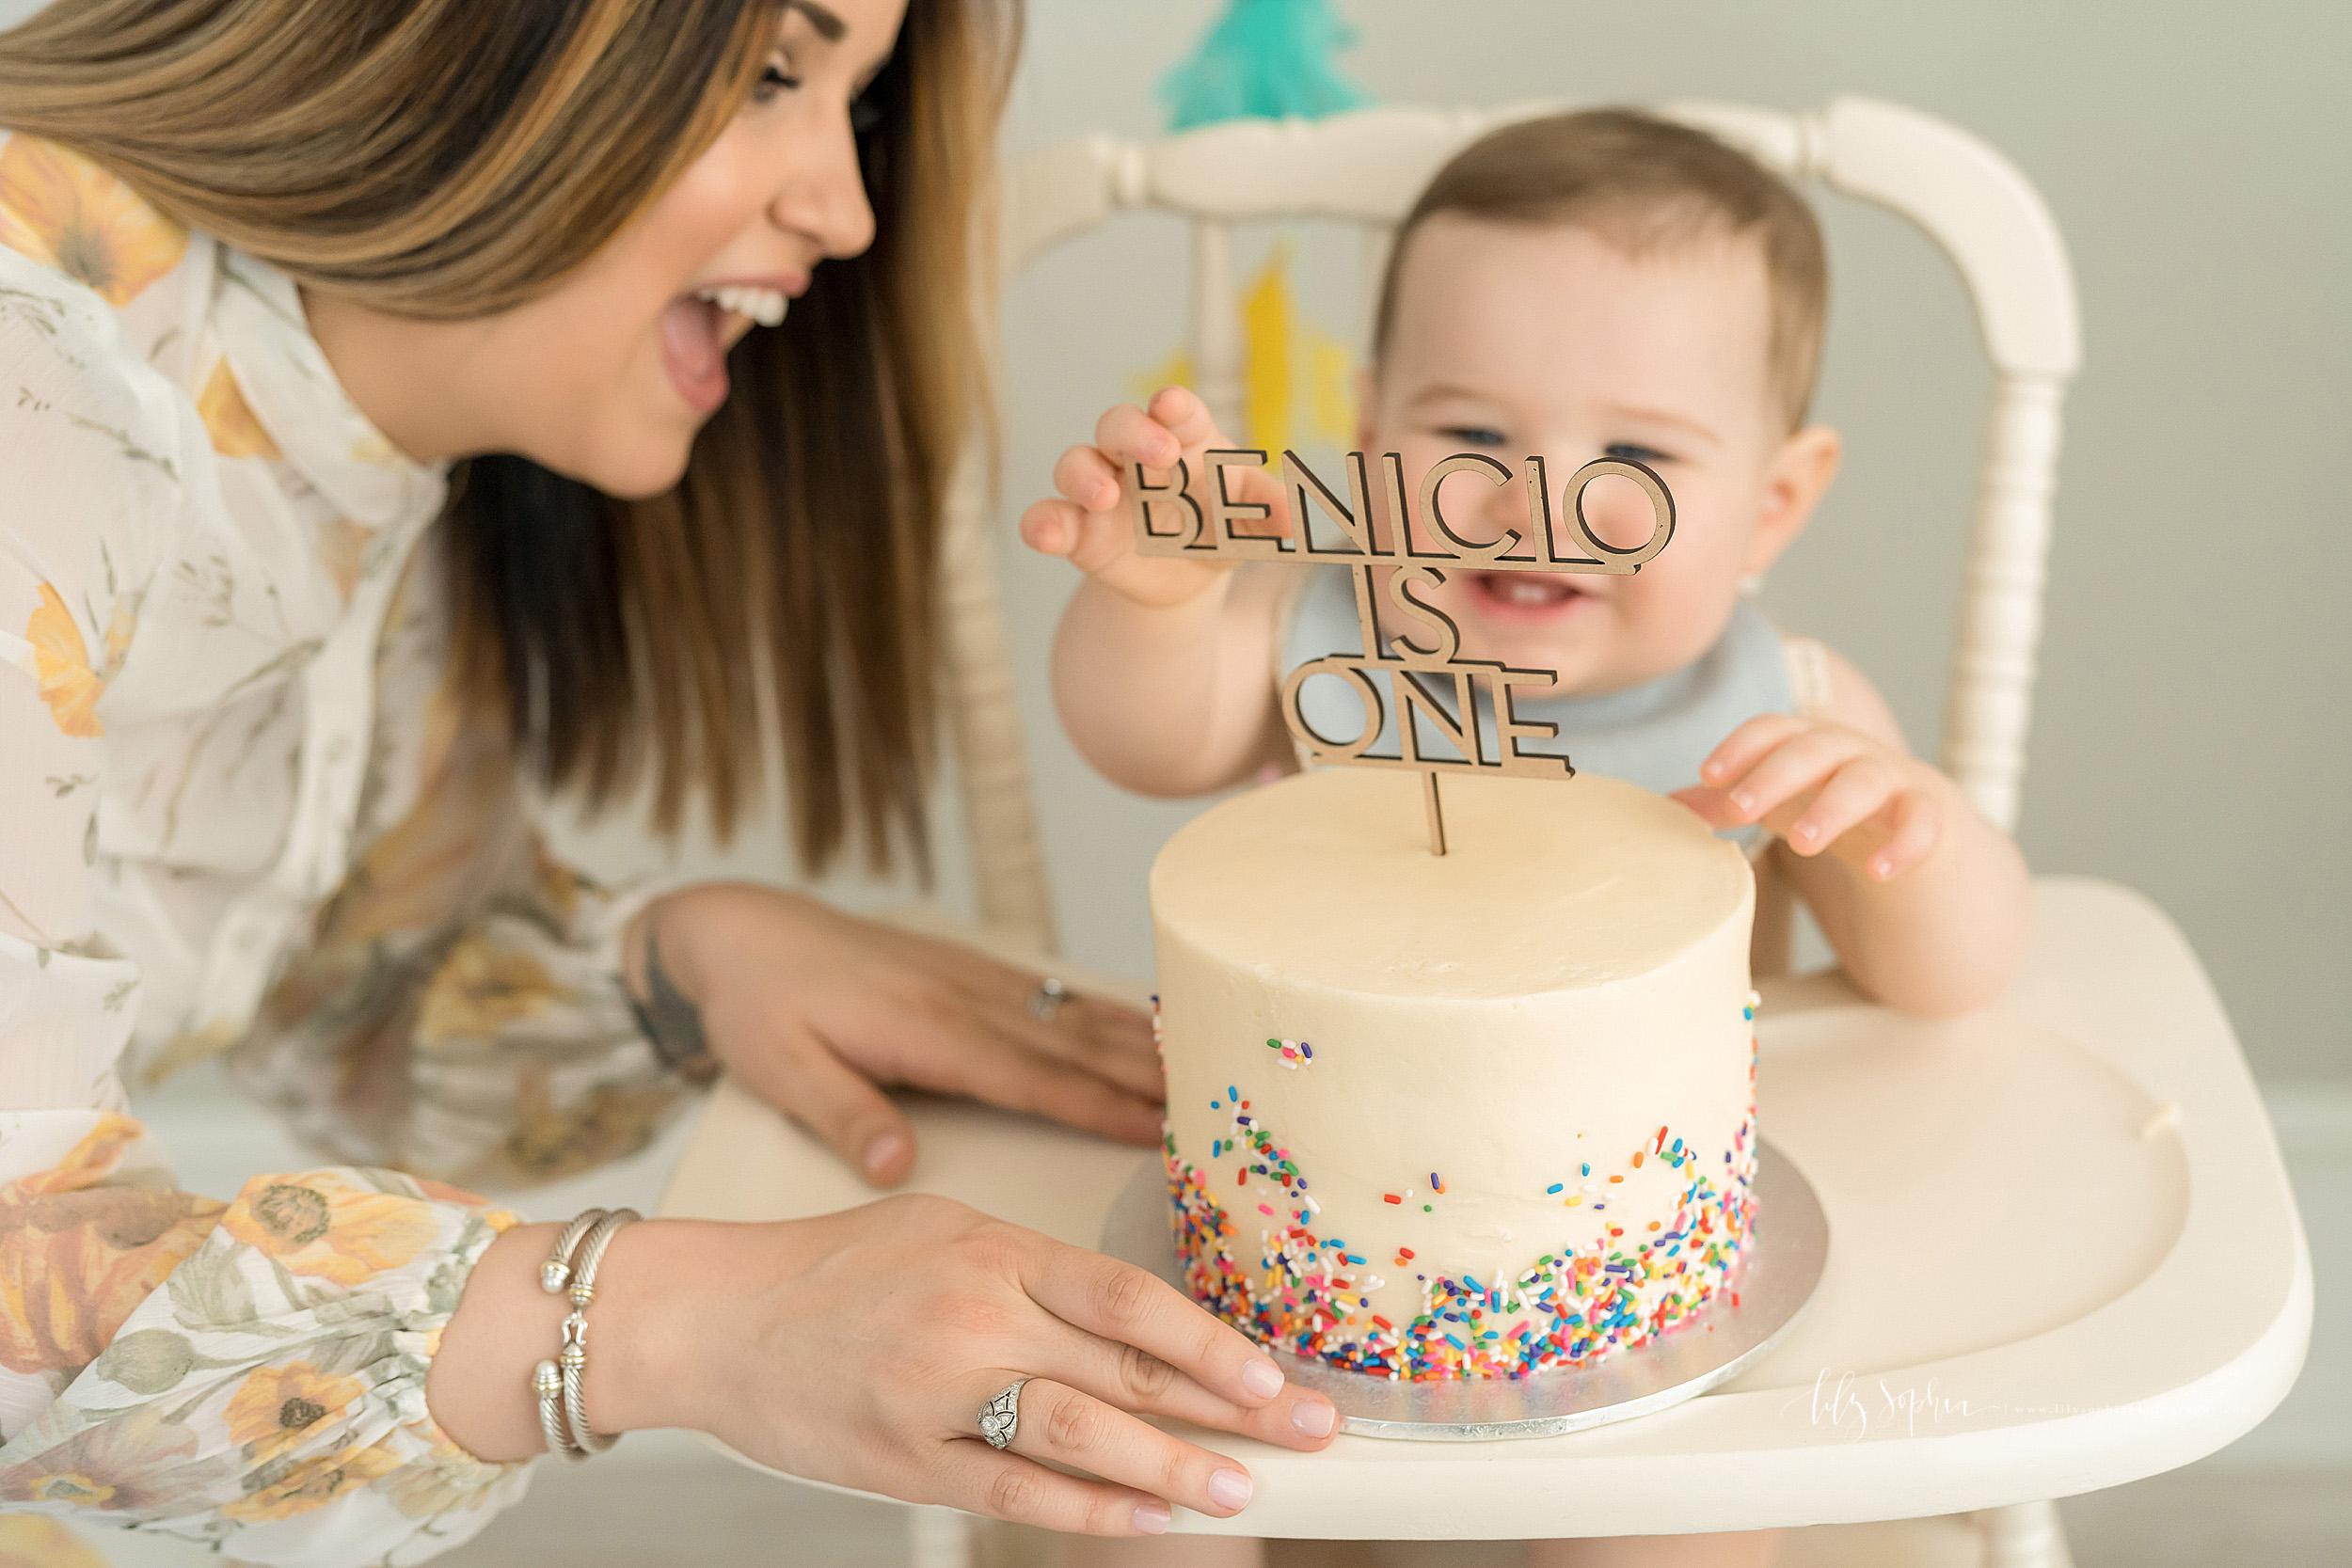 atlanta-decatur-candler-park-sandy-springs-buckhead-virginia-highlands-west-end-decatur-lily-sophia-photography-one-year-old-baby-boy-milestone-studio-family-photos-first-birthday-sprinkle-cake-smash_2212.jpg